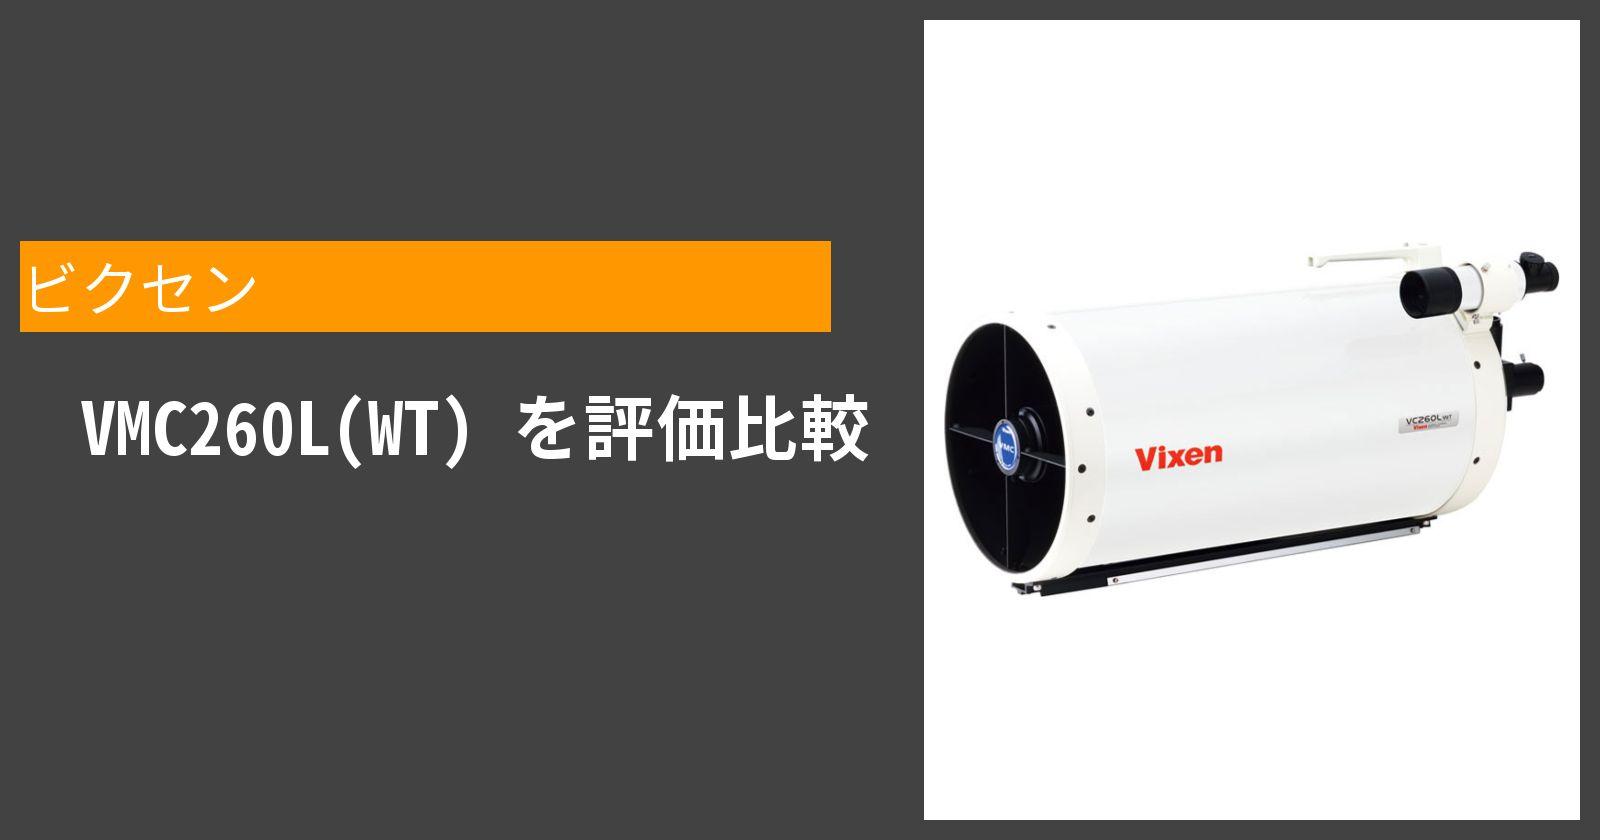 VMC260L(WT)を徹底評価